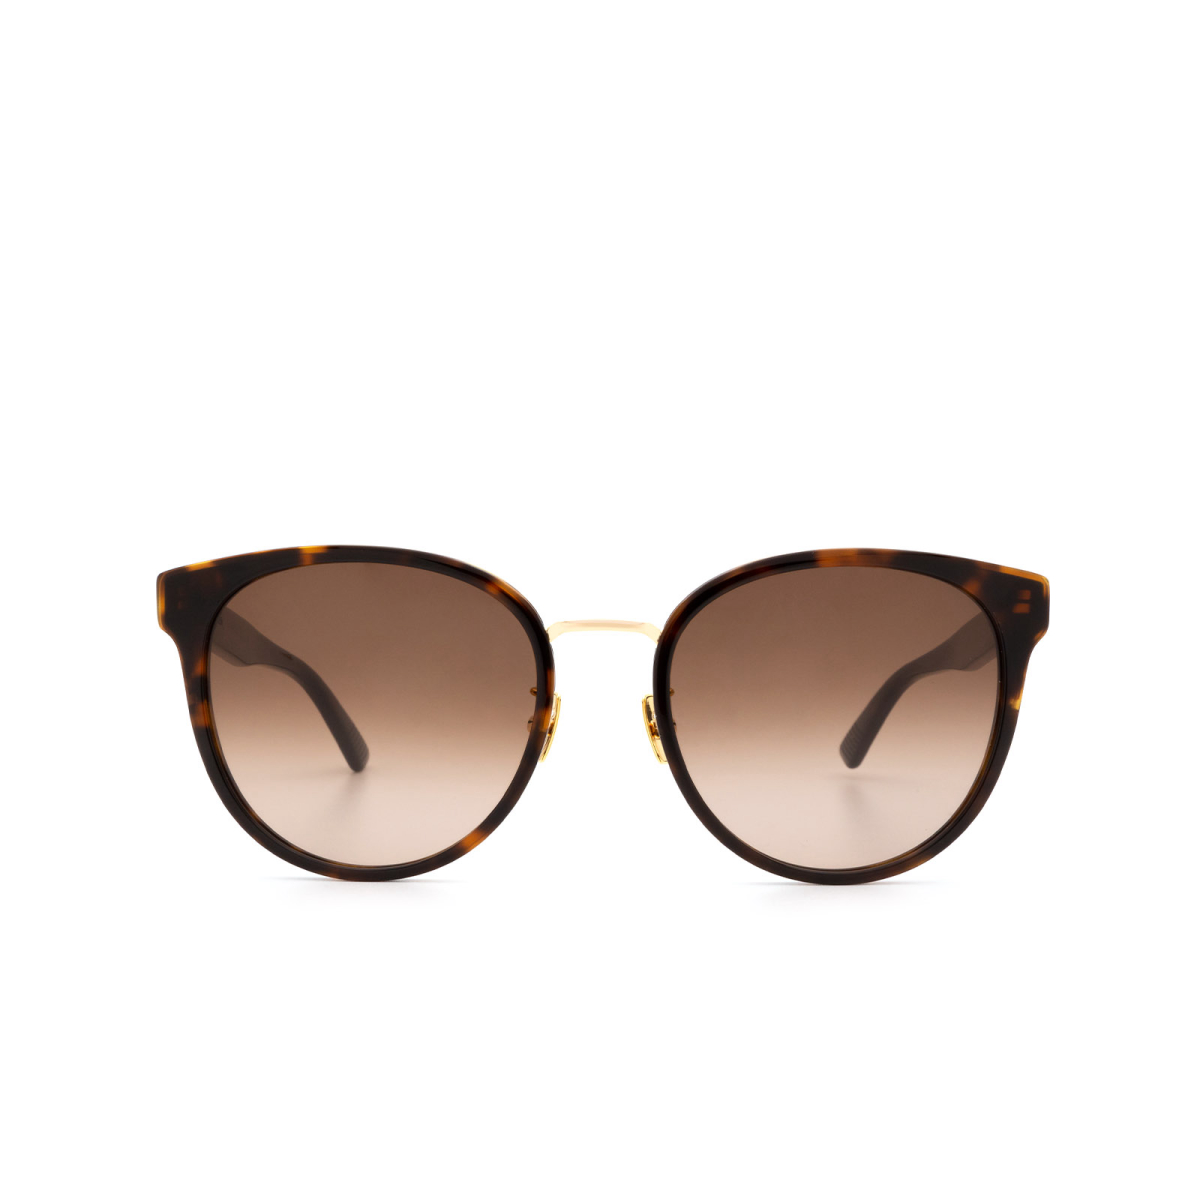 Bottega Veneta® Round Sunglasses: BV1081SK color Havana 003.